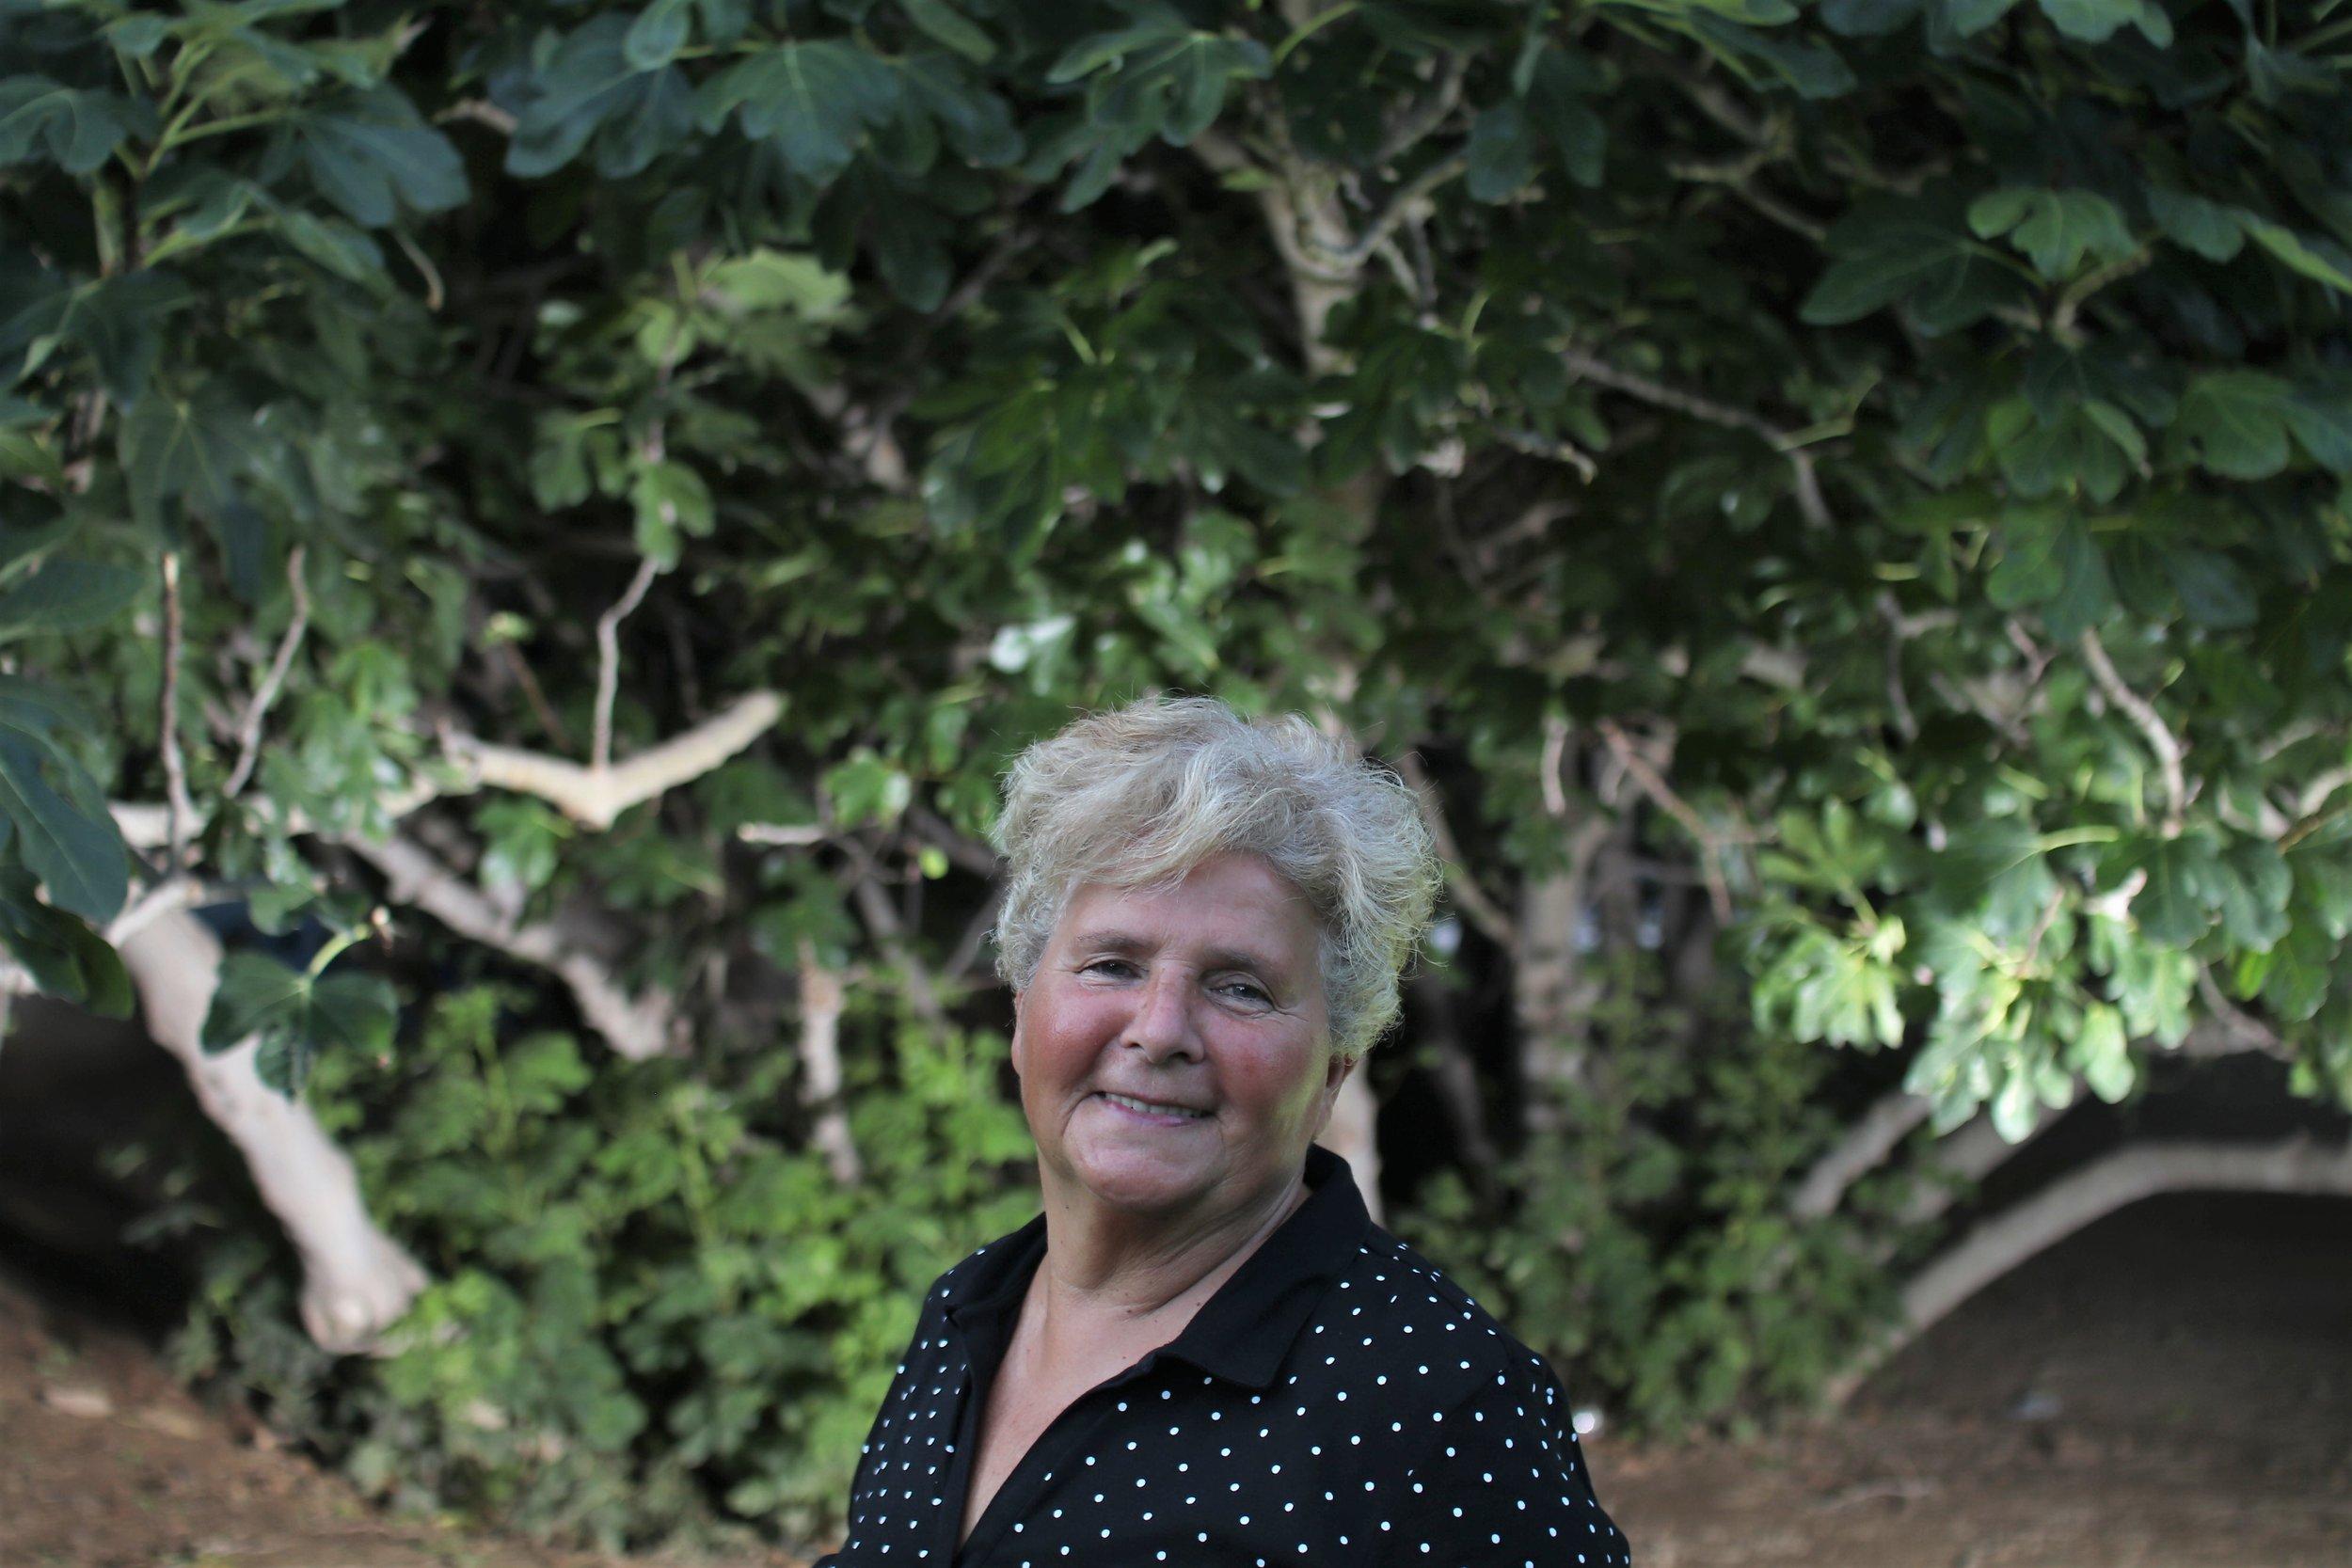 Conchi Arnal, profesora y pionera de la autodefensa feminista, y activista histórica LGTB, posando para DIVERSES MAGAZINE. Foto: Torres-Solanot